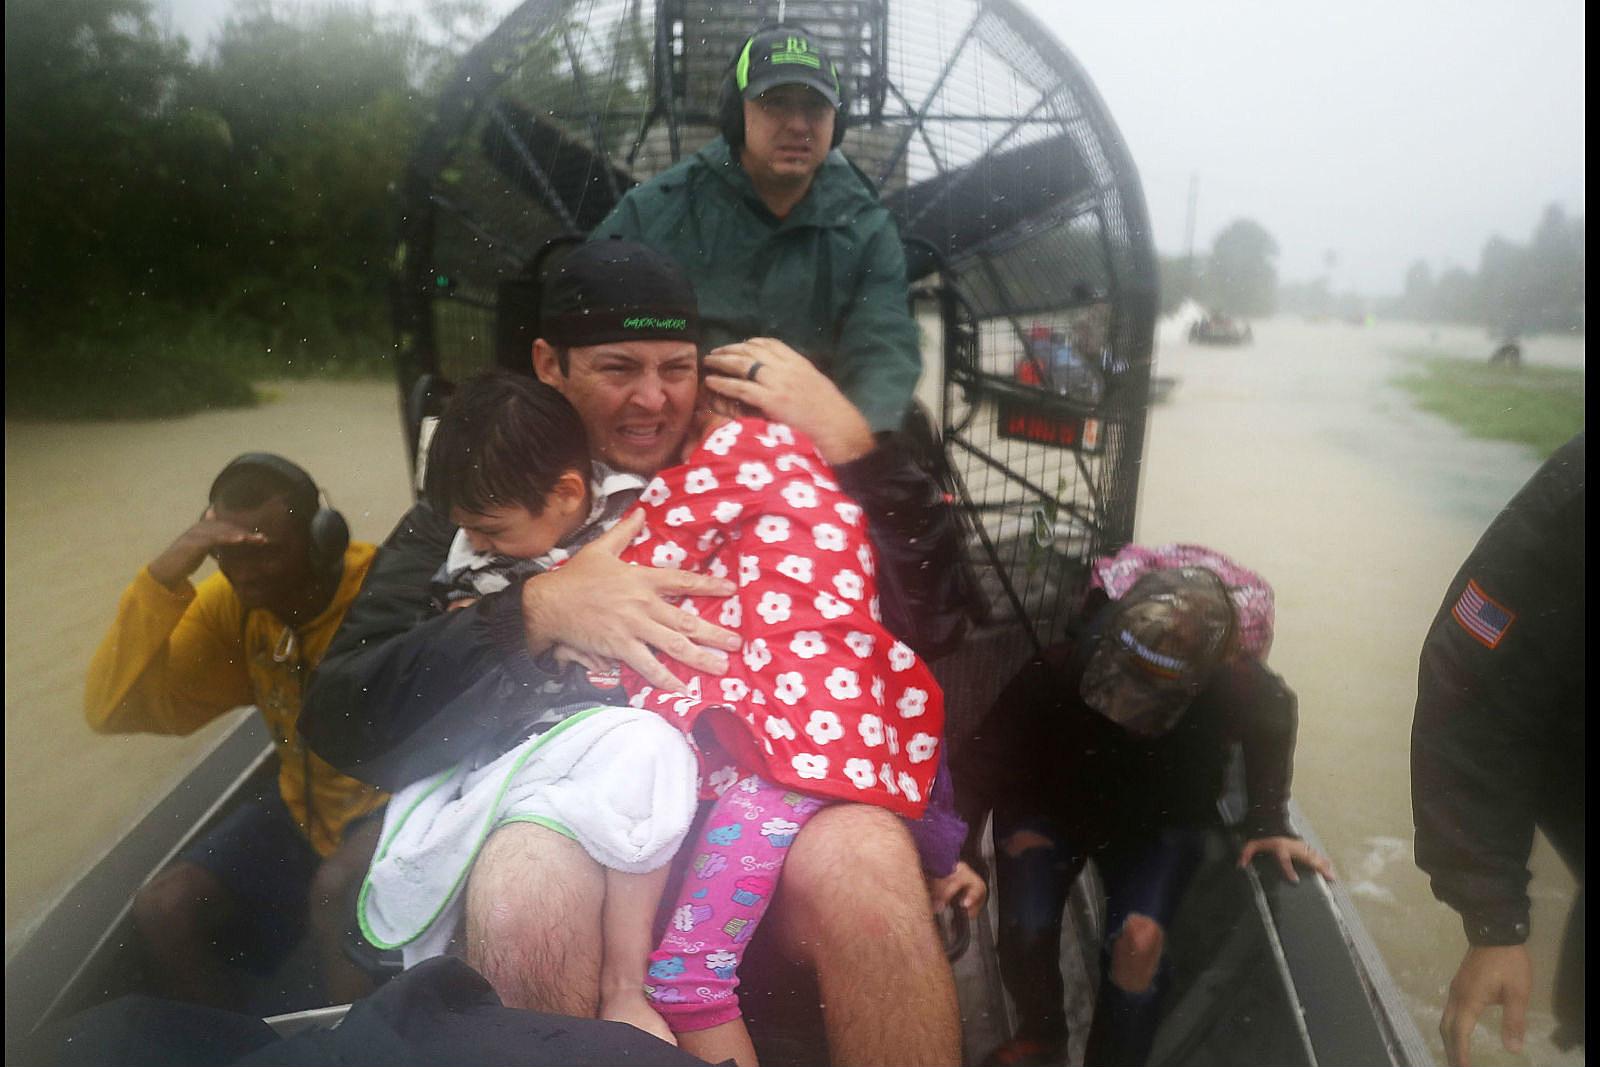 Joe Raedle, Getty Images